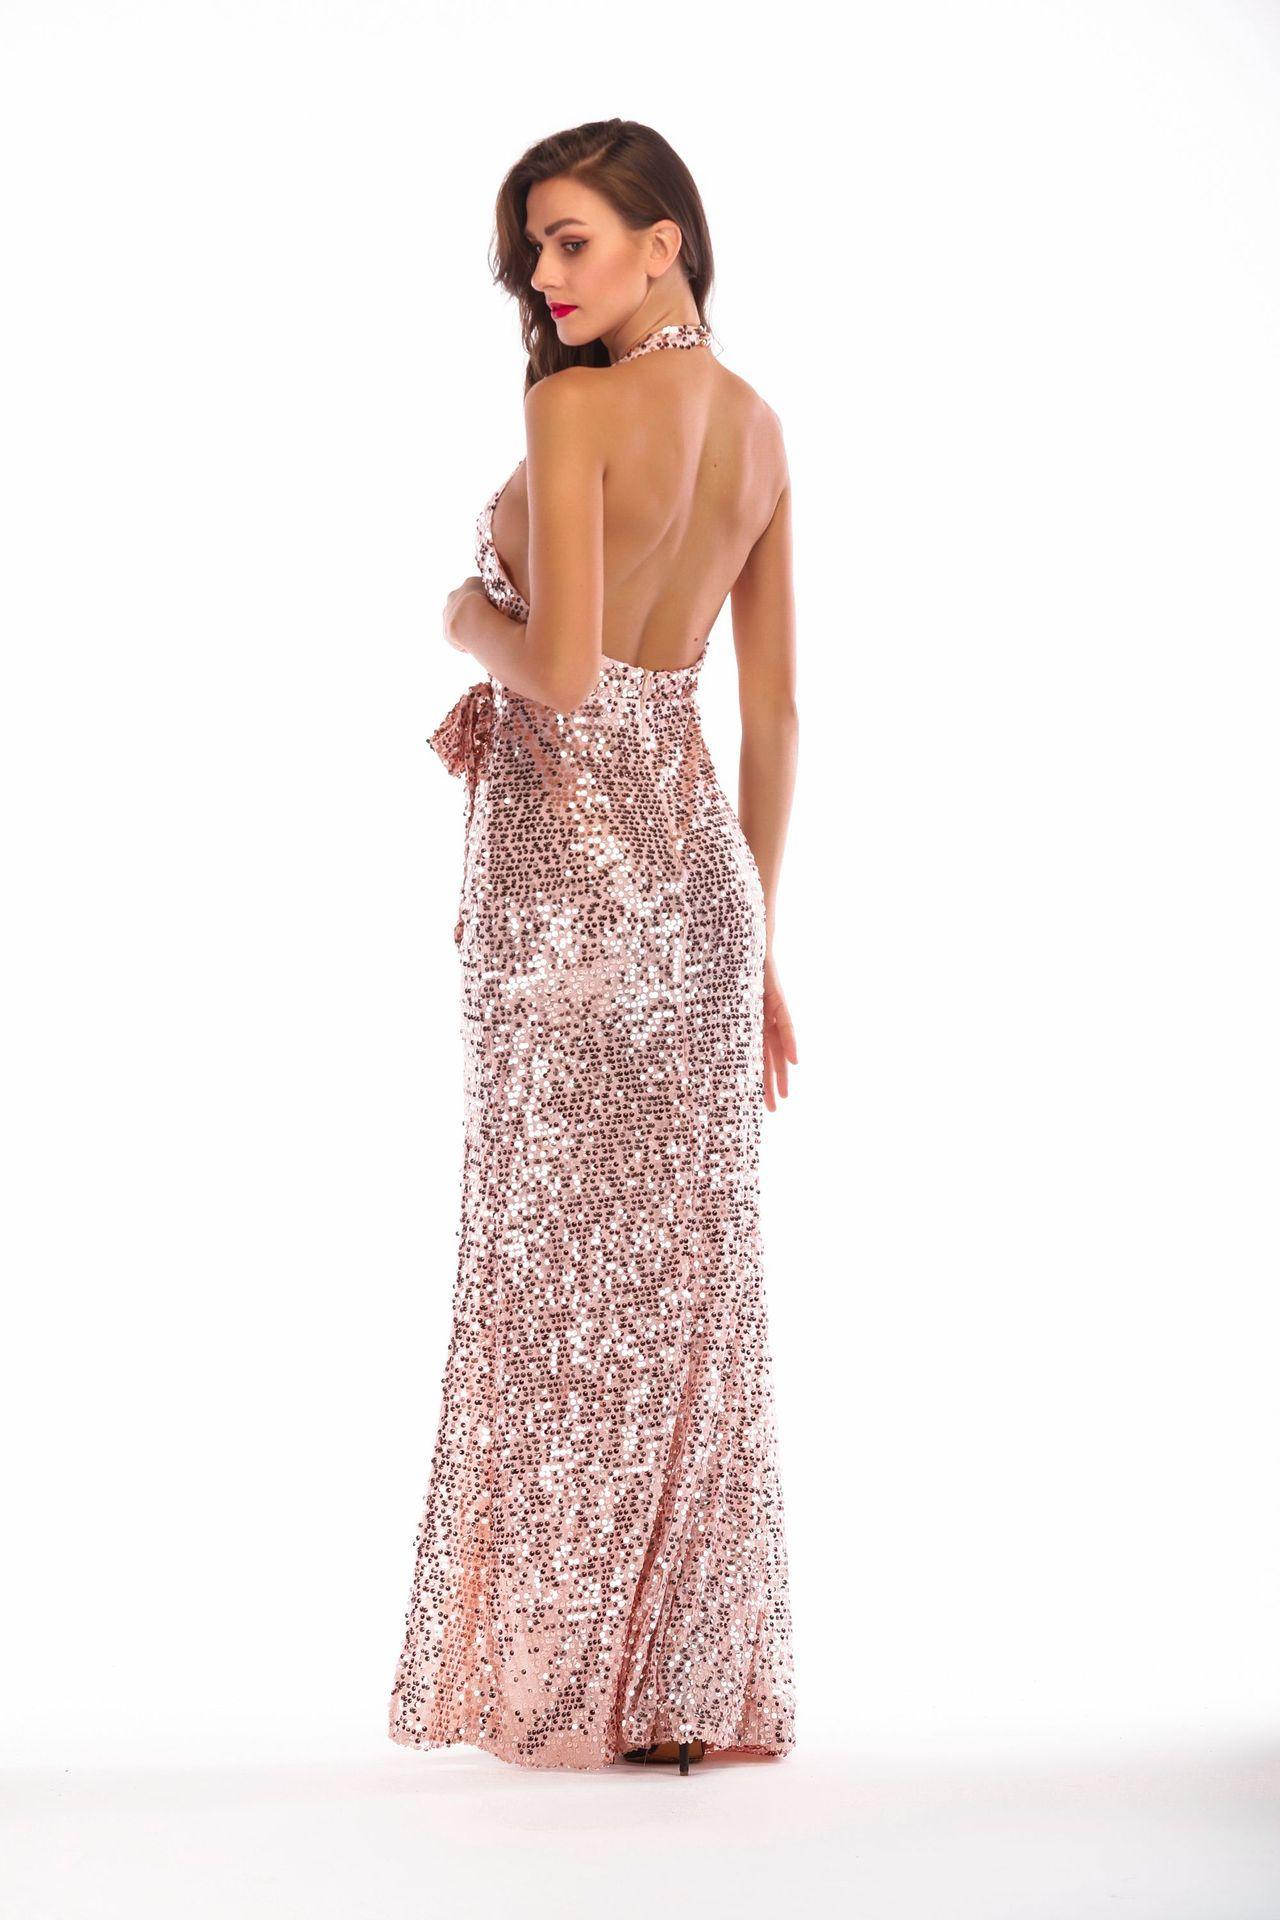 sexy sequin backless suspender dress party kleider fashion sukienka glitter  vestidos robe femme long dress women 4968e132aefd